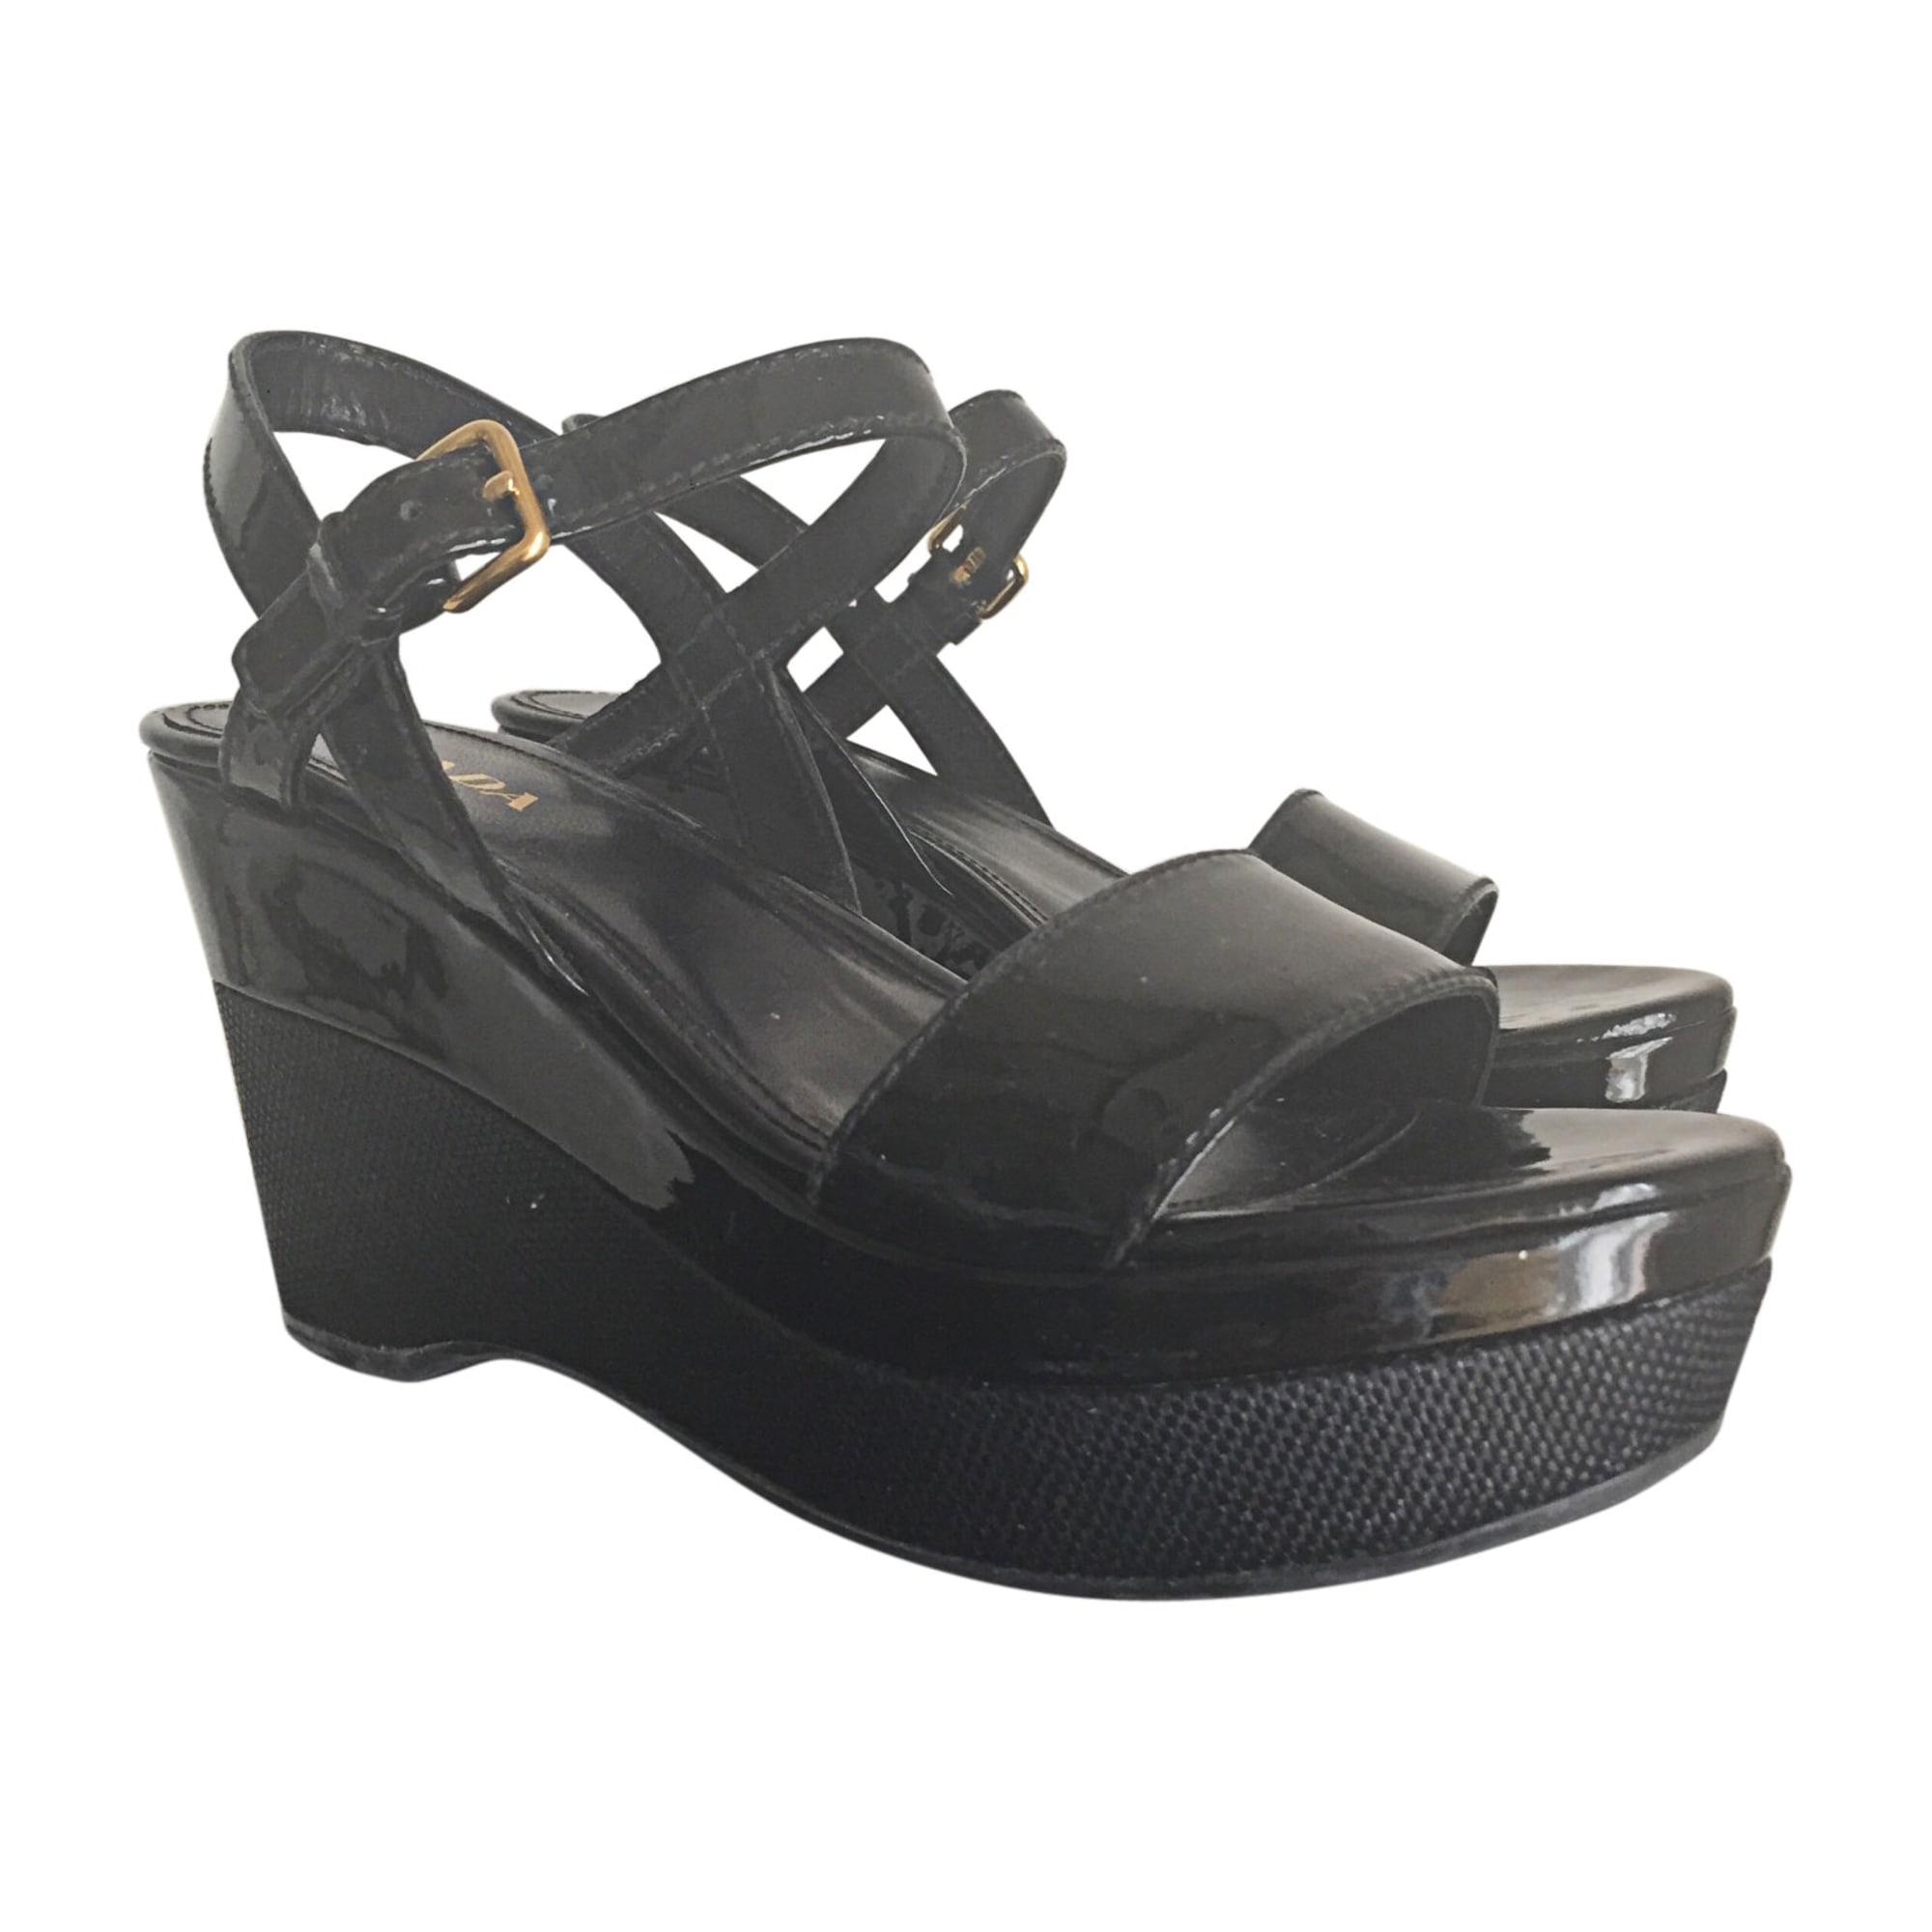 Compensées 7694771 39 Sandales Noir Prada wZ6fAYYx